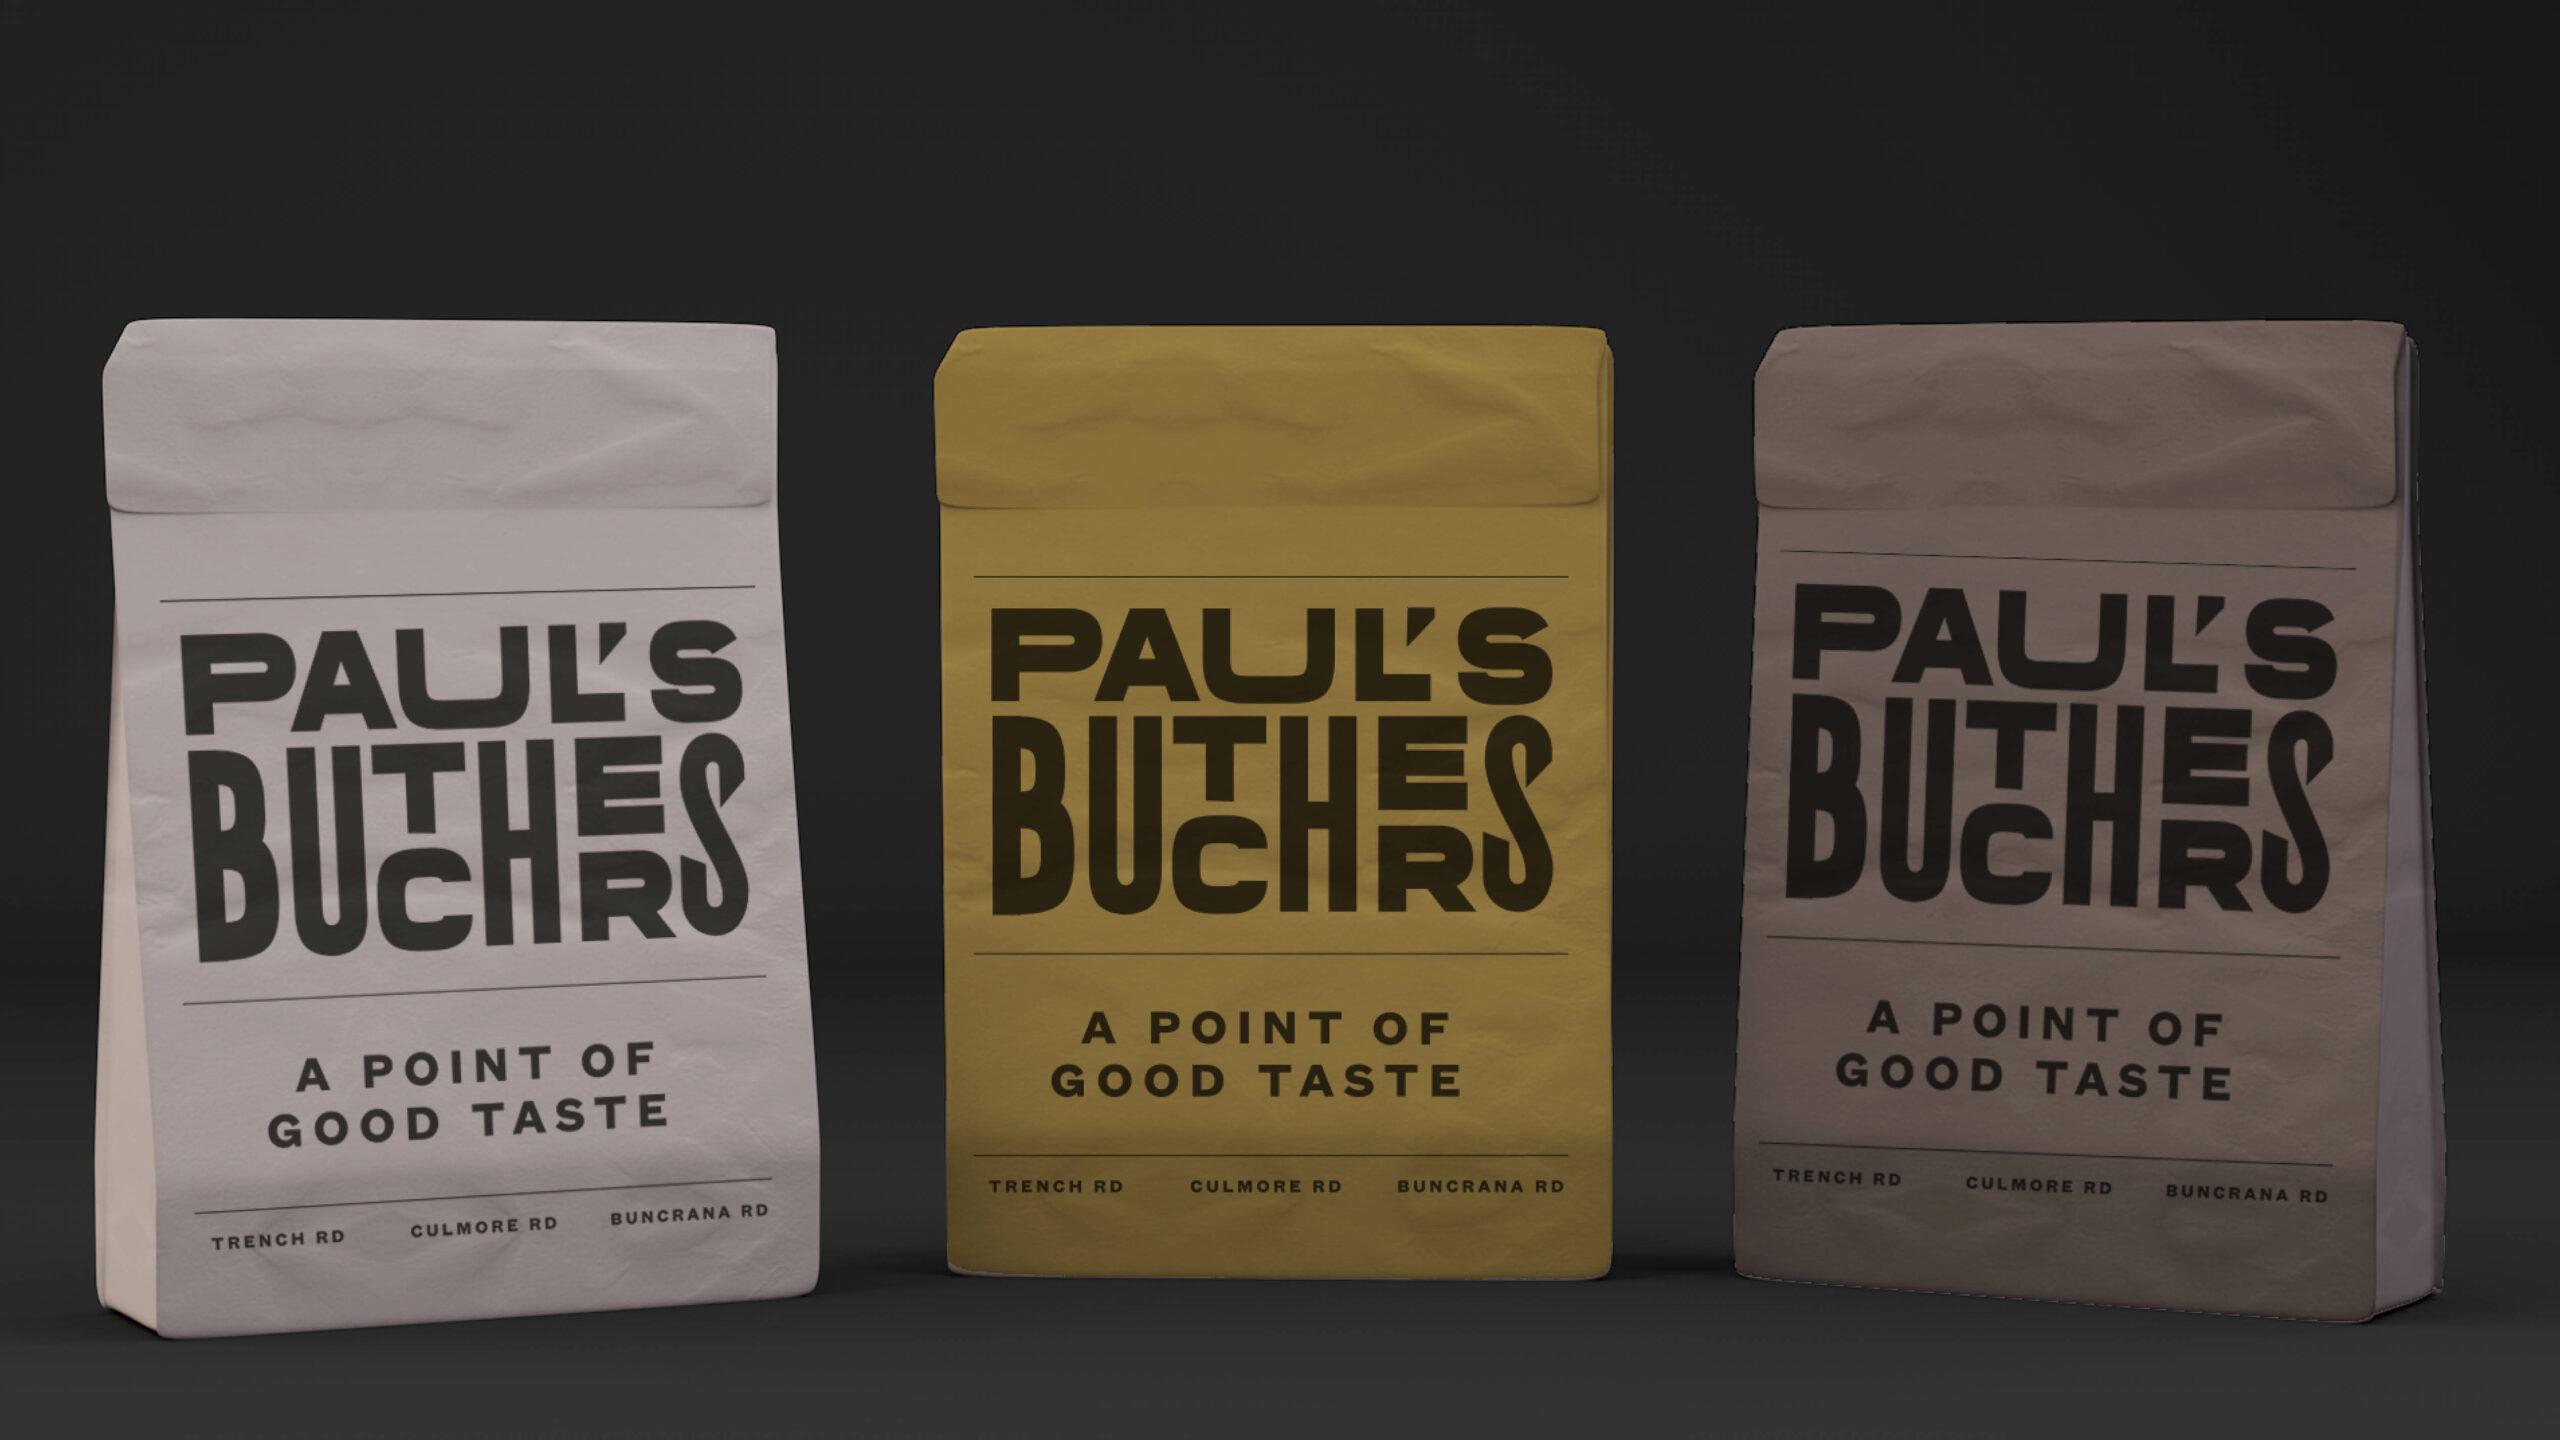 Paul's Butchers